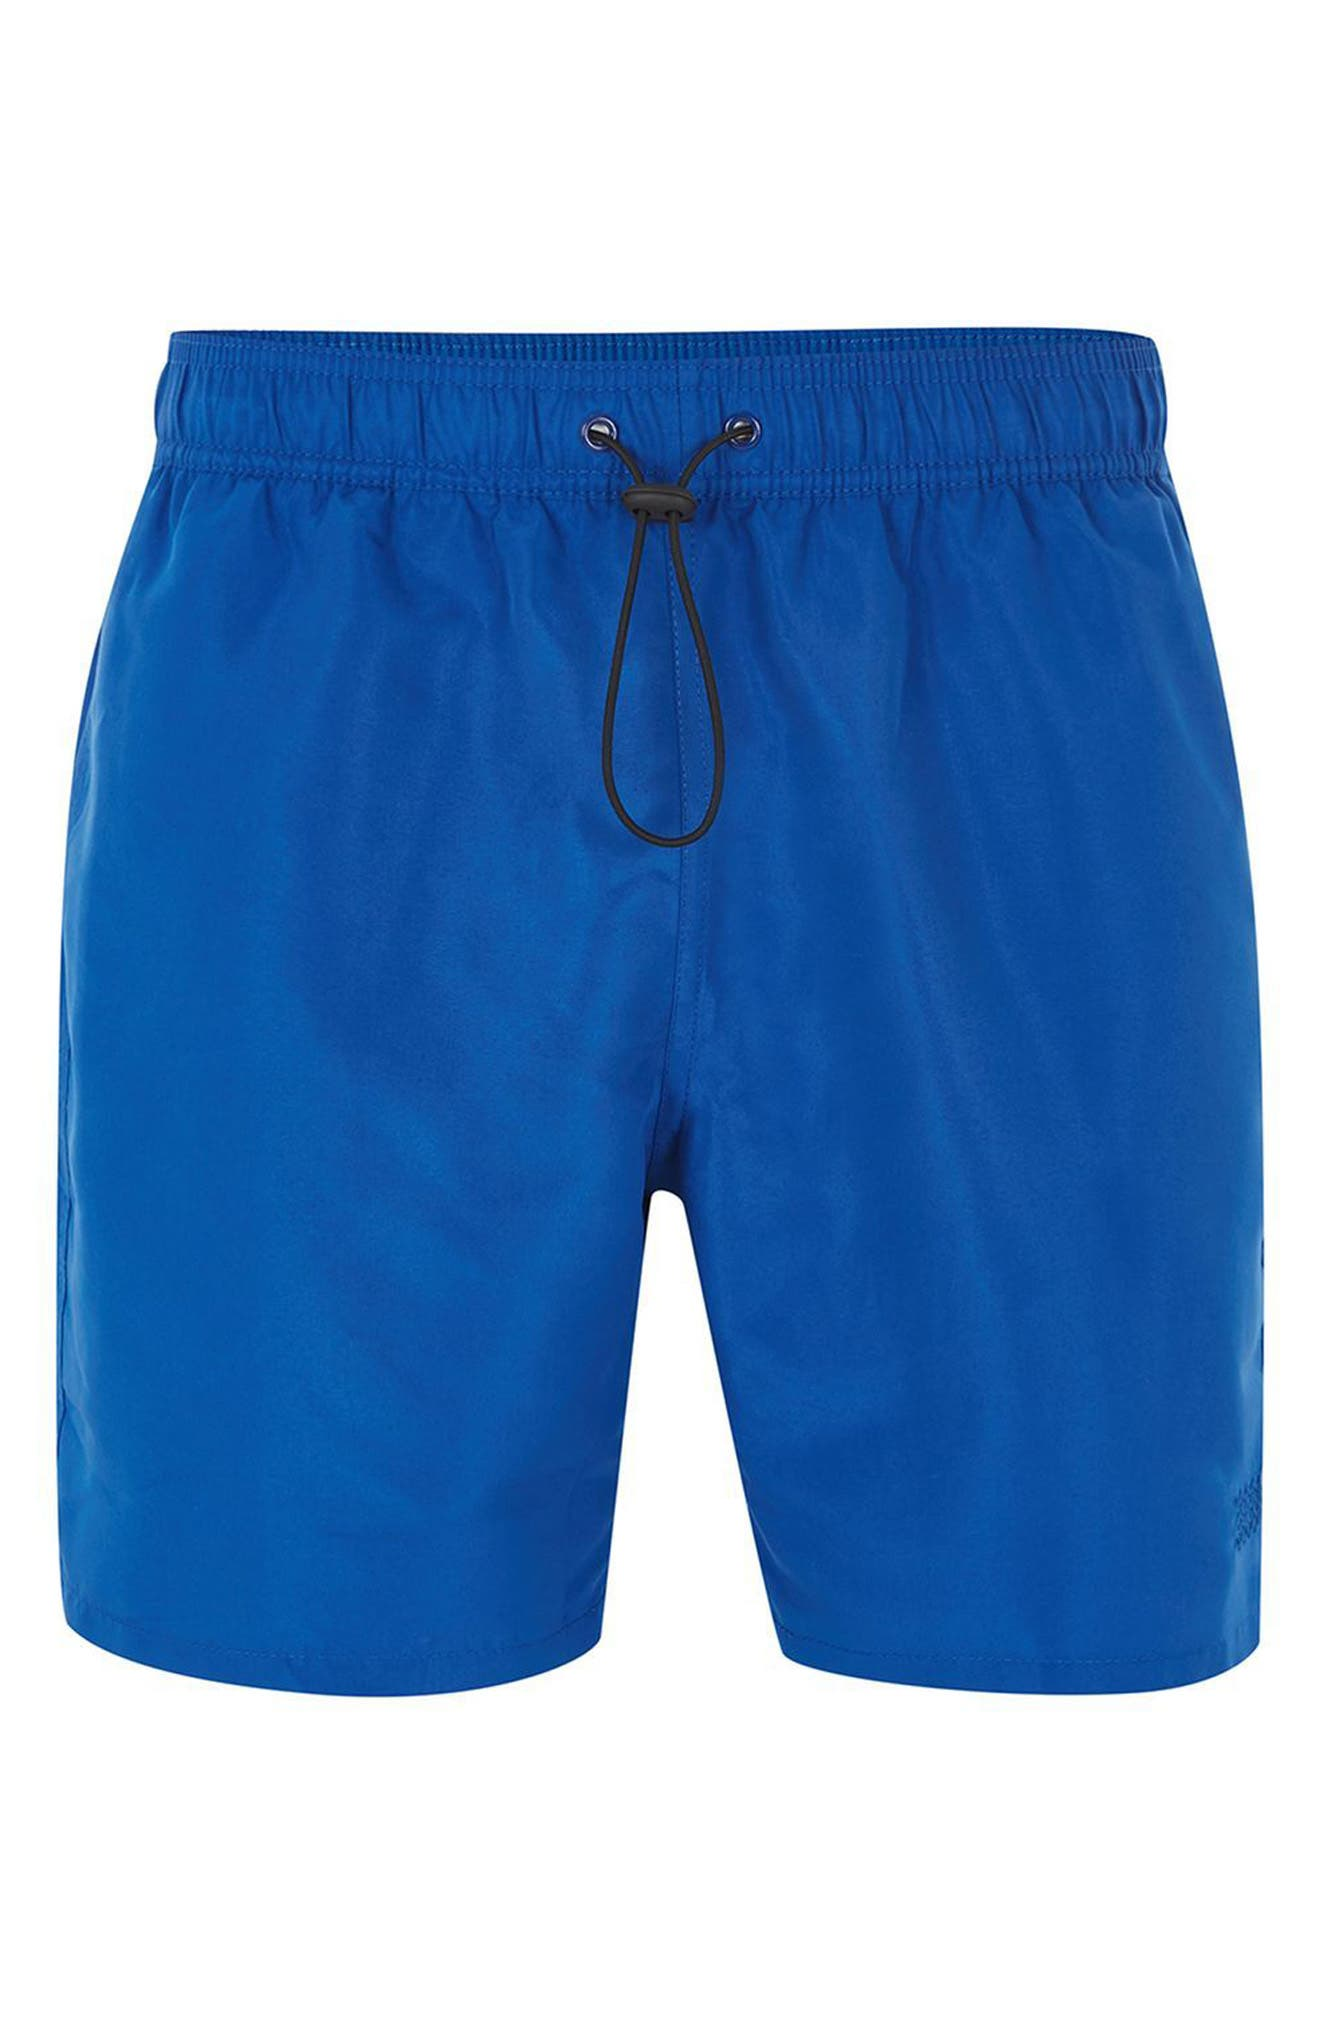 Alternate Image 4  - Topman Swim Trunks